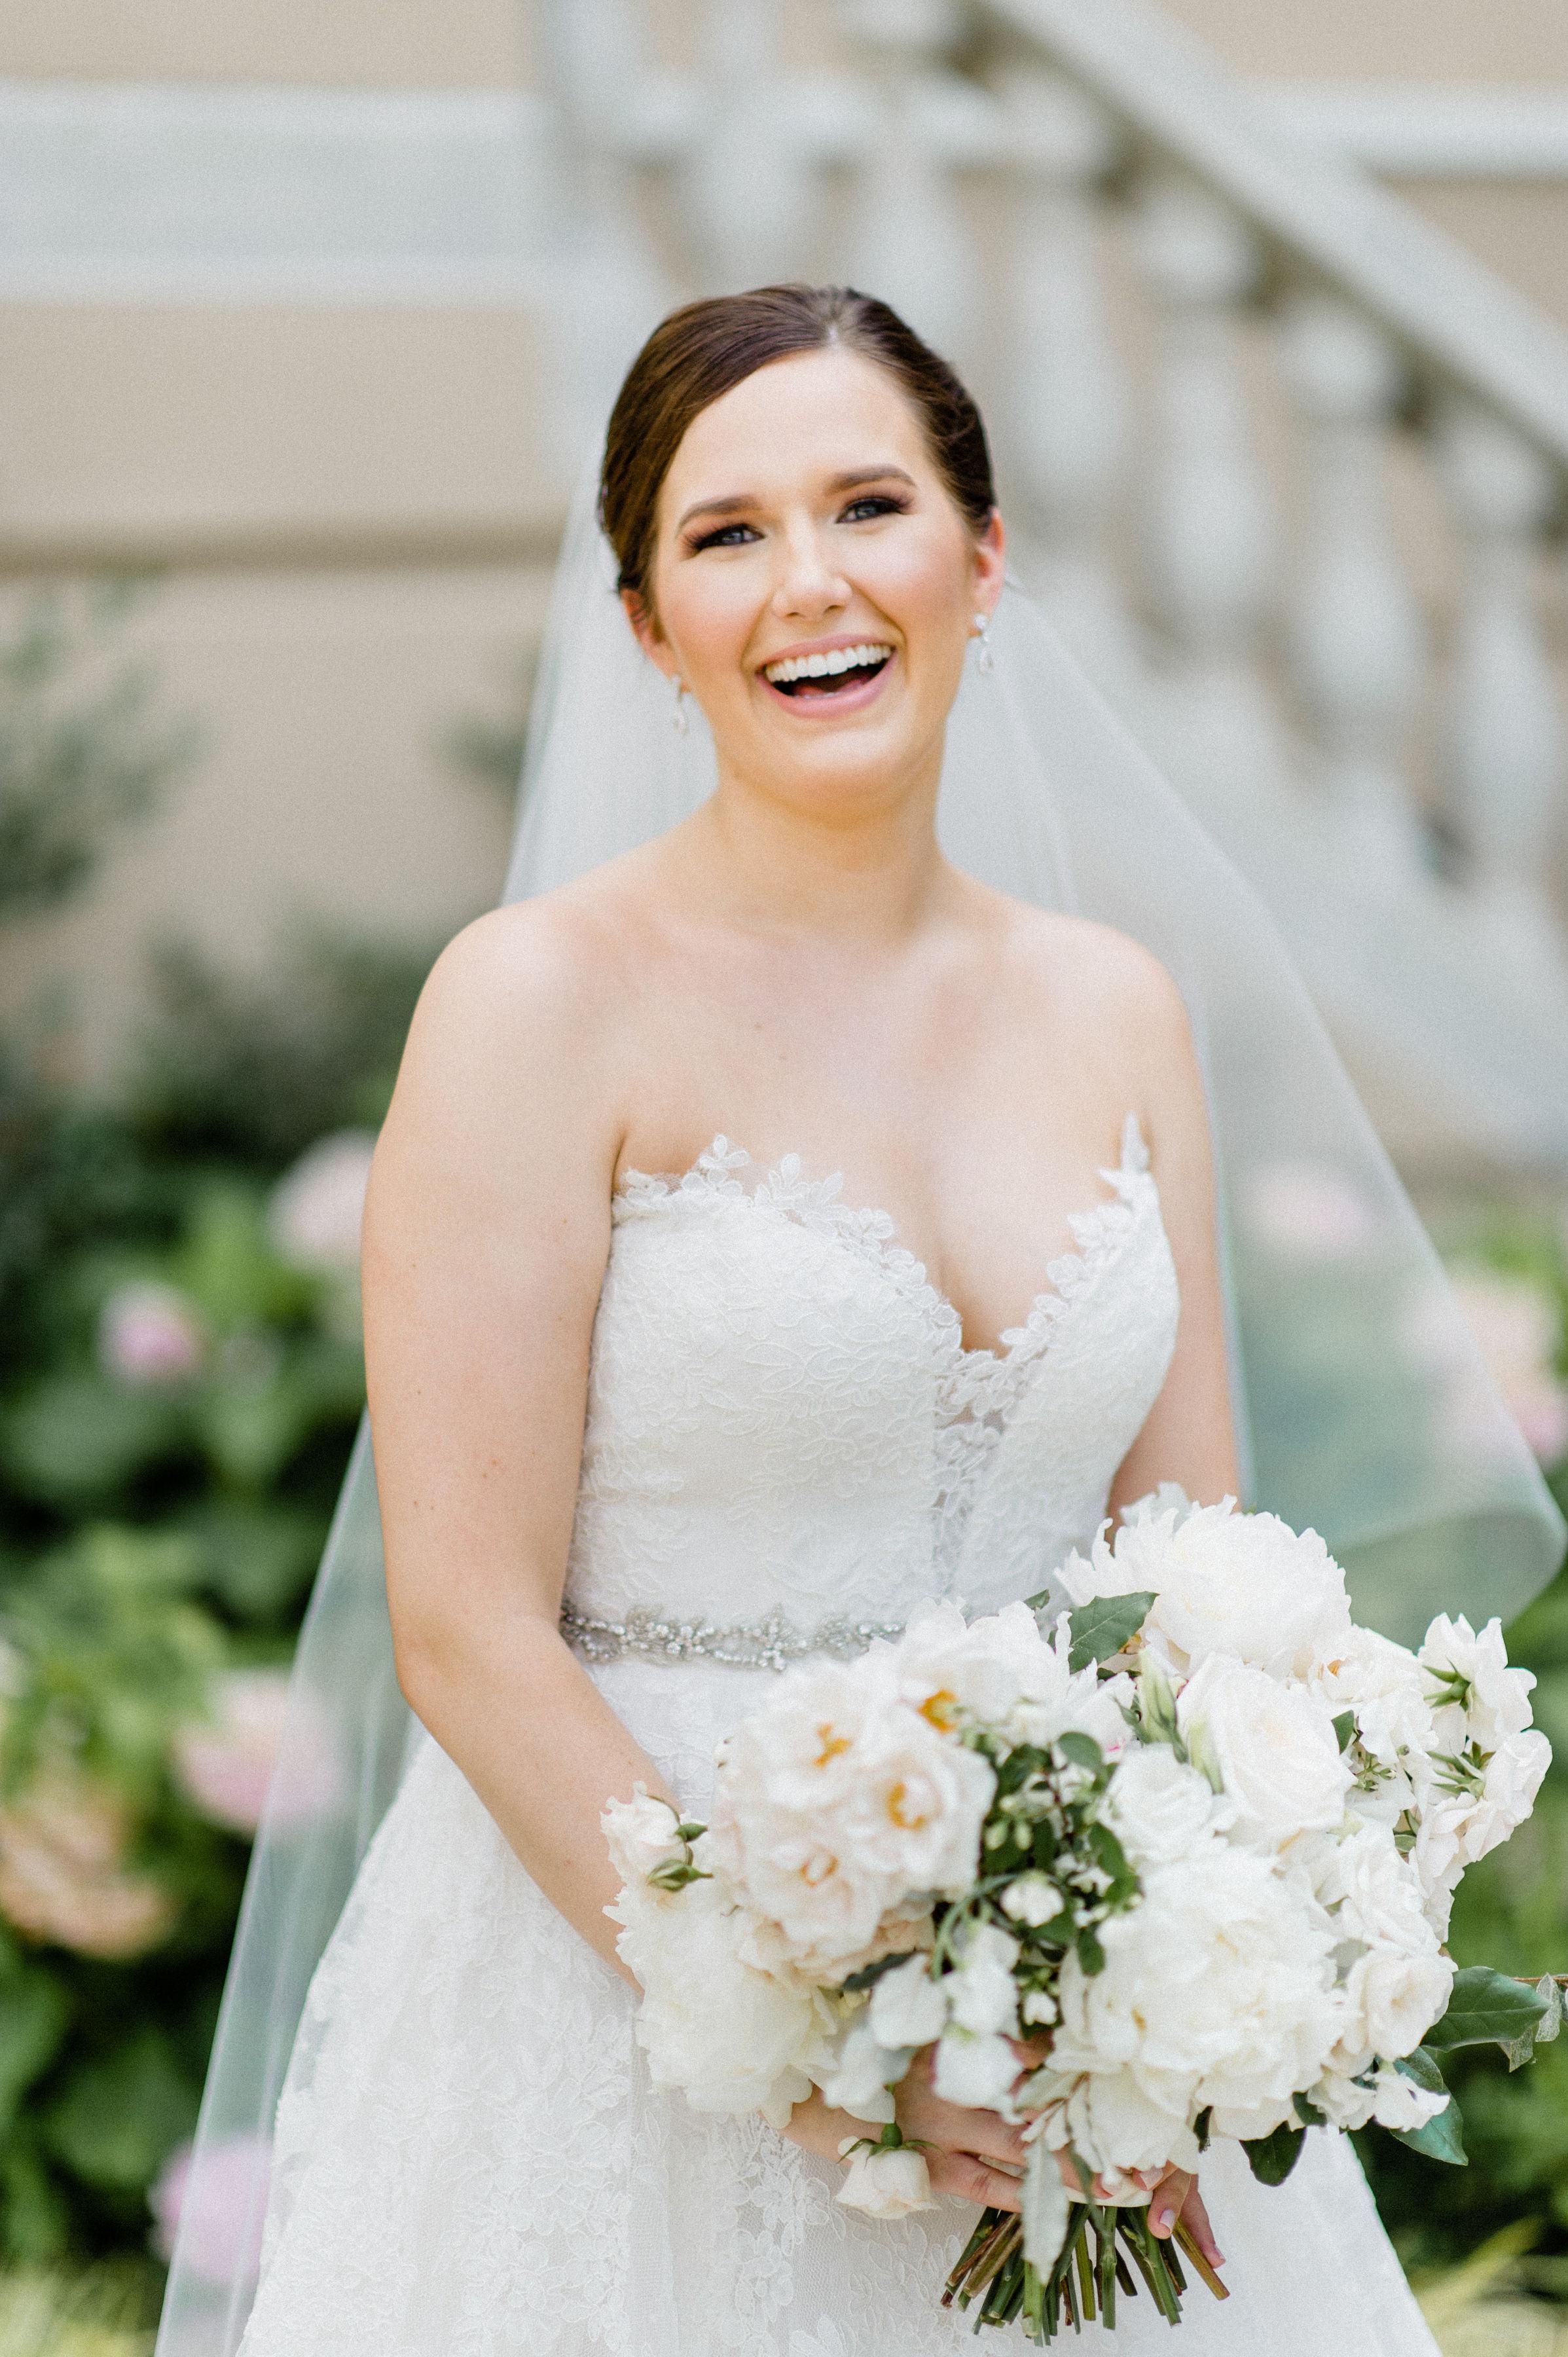 McElravey_Wedding_CarolineLimaPhotography_2018_218.jpg